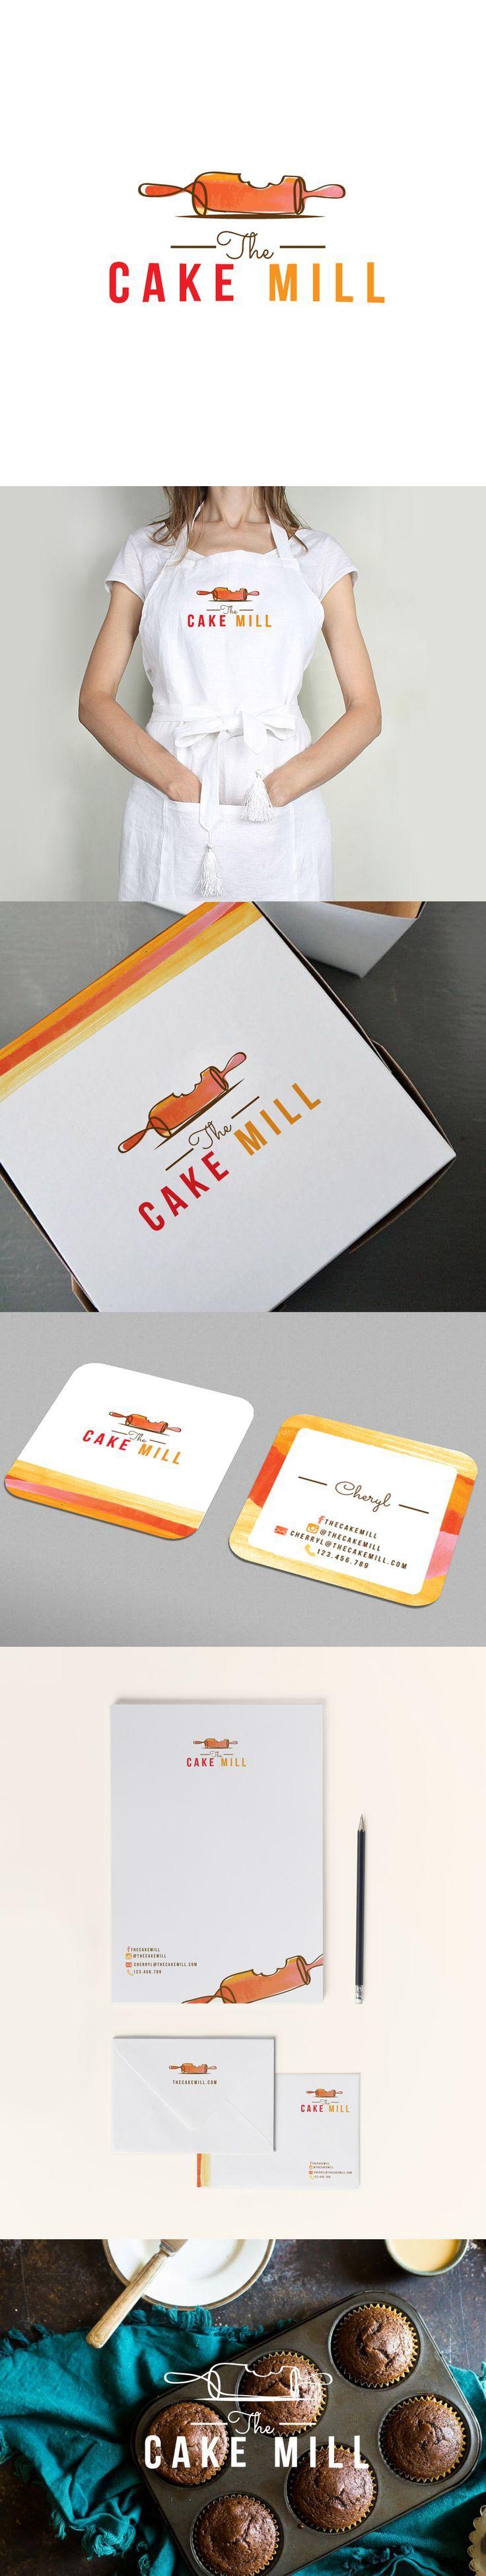 15 best bakery logo ideas images on pinterest